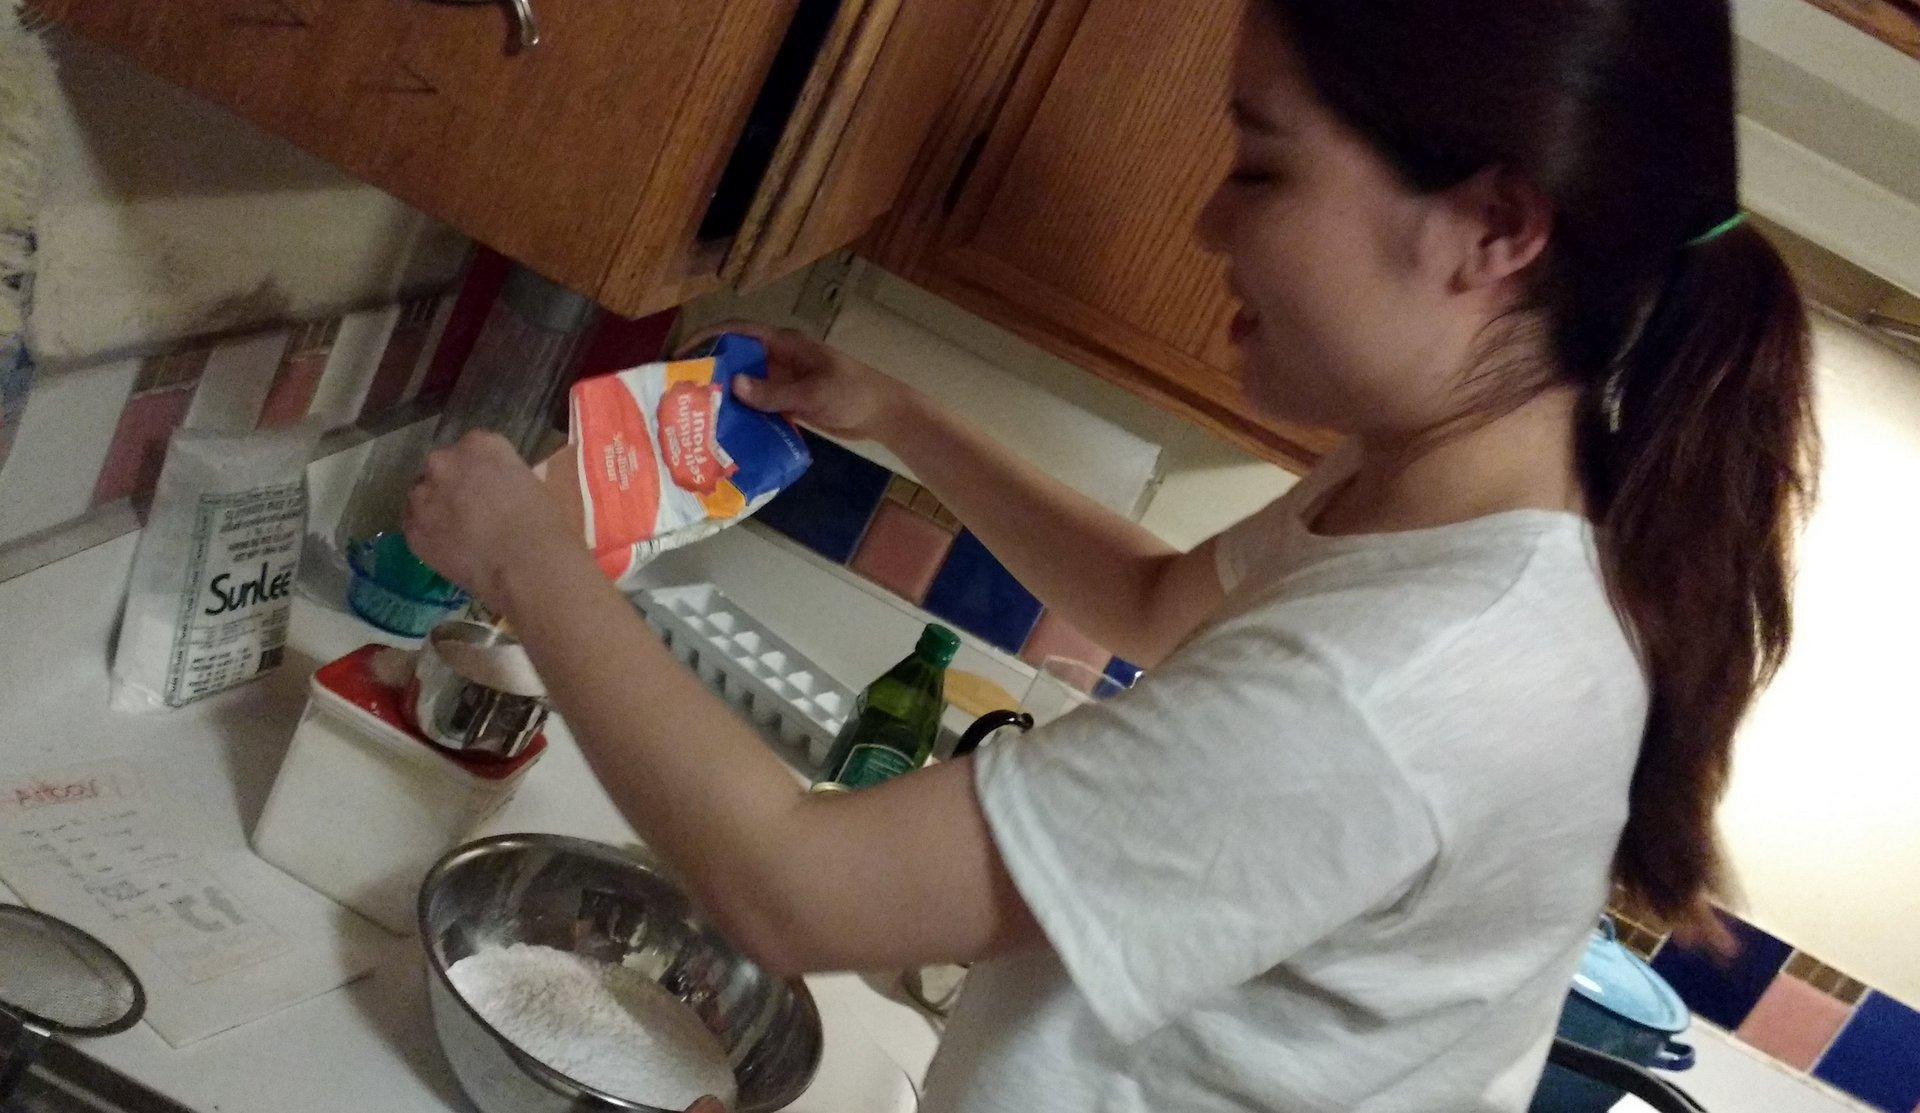 Soojeen mixing ingredients